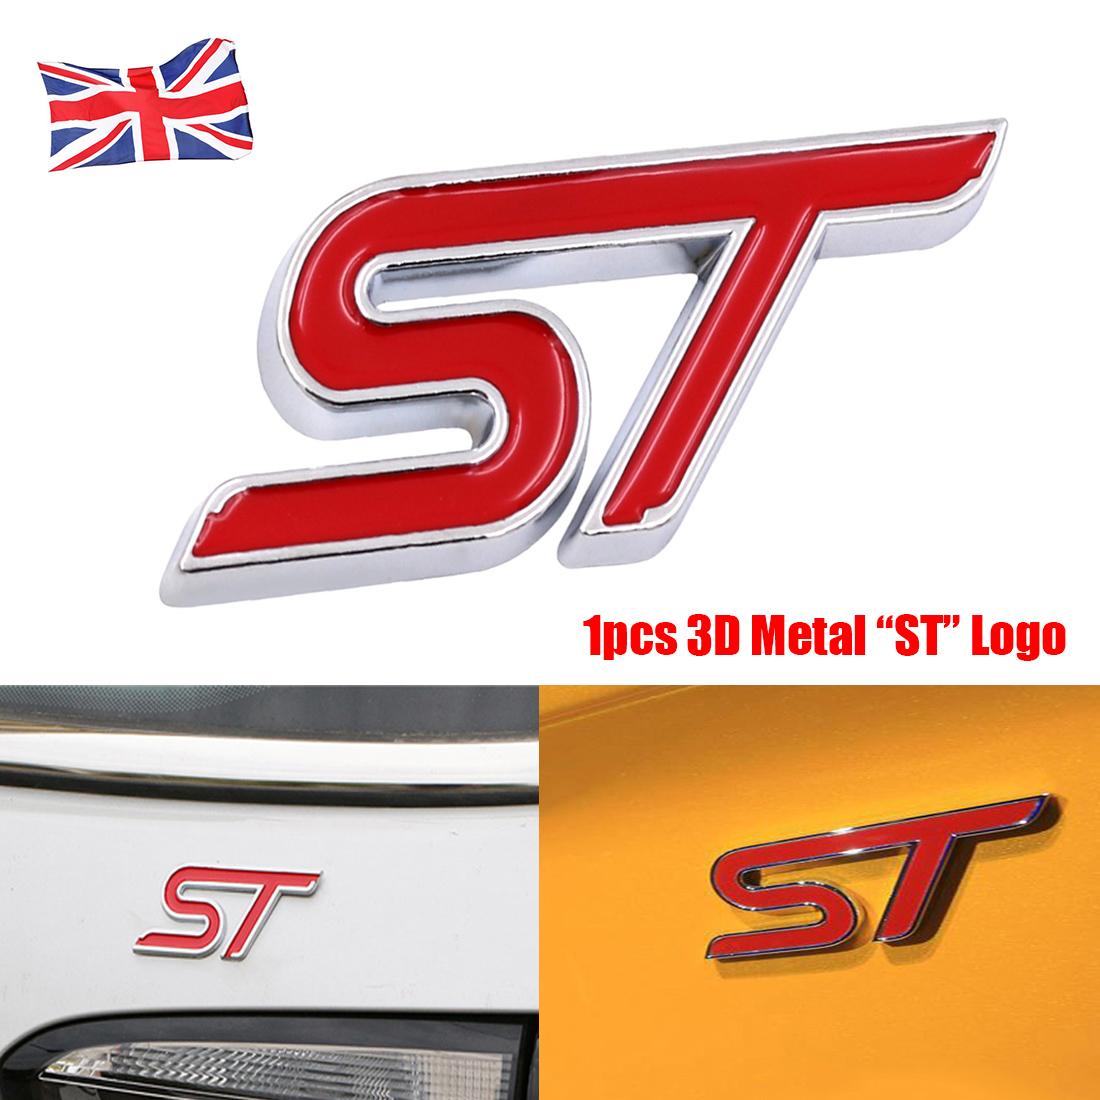 2X M Emblem 3 Color Decal Badge Sticker for Auto Car Van Front Fender Bumper Trunk Boot Window